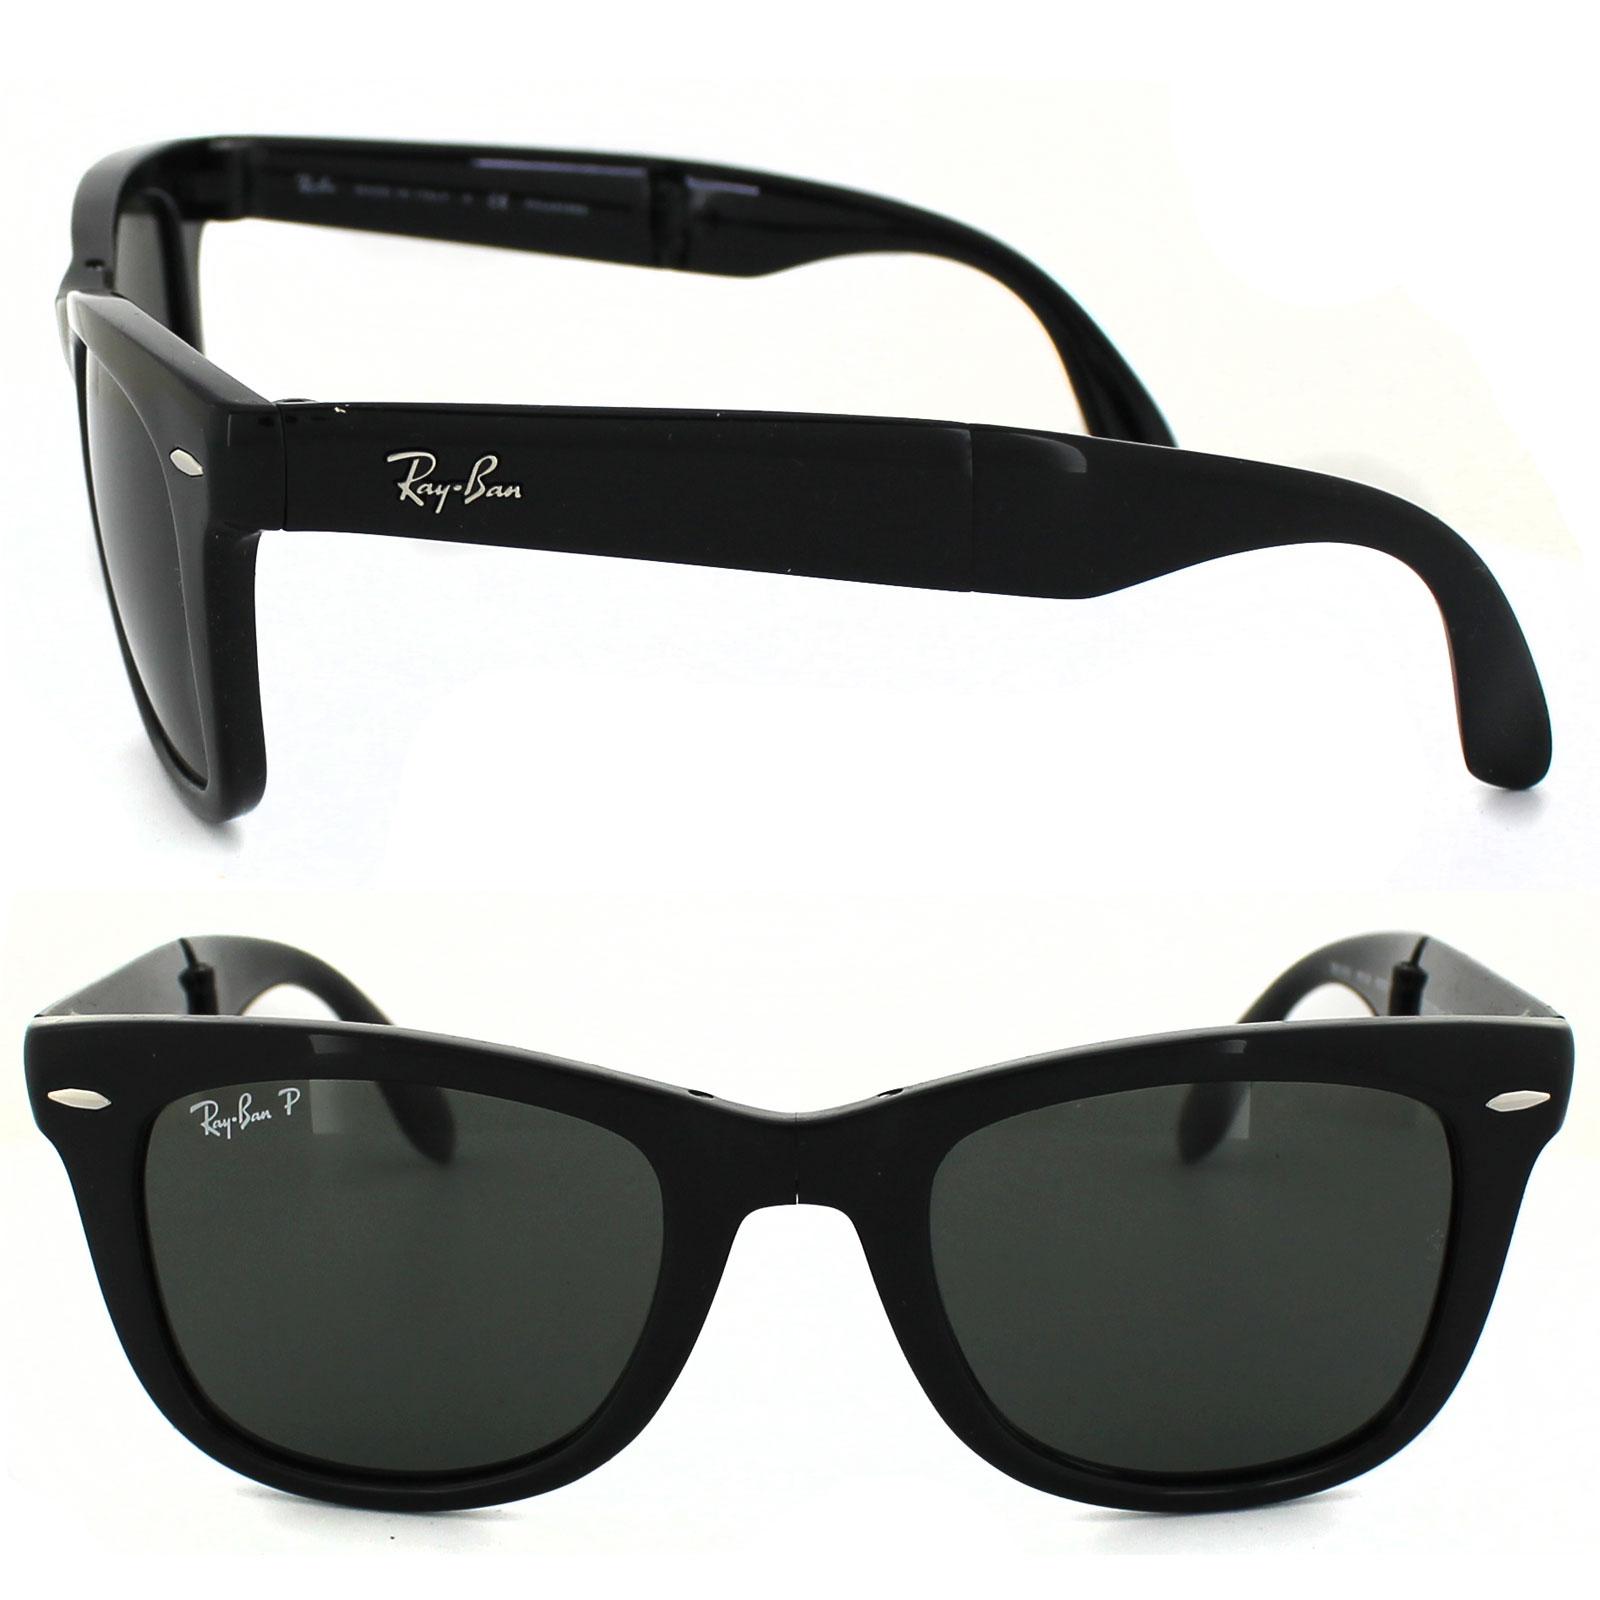 Ray-Ban Folding Sonnenbrille Schwarz 601 54mm VchjZzeR